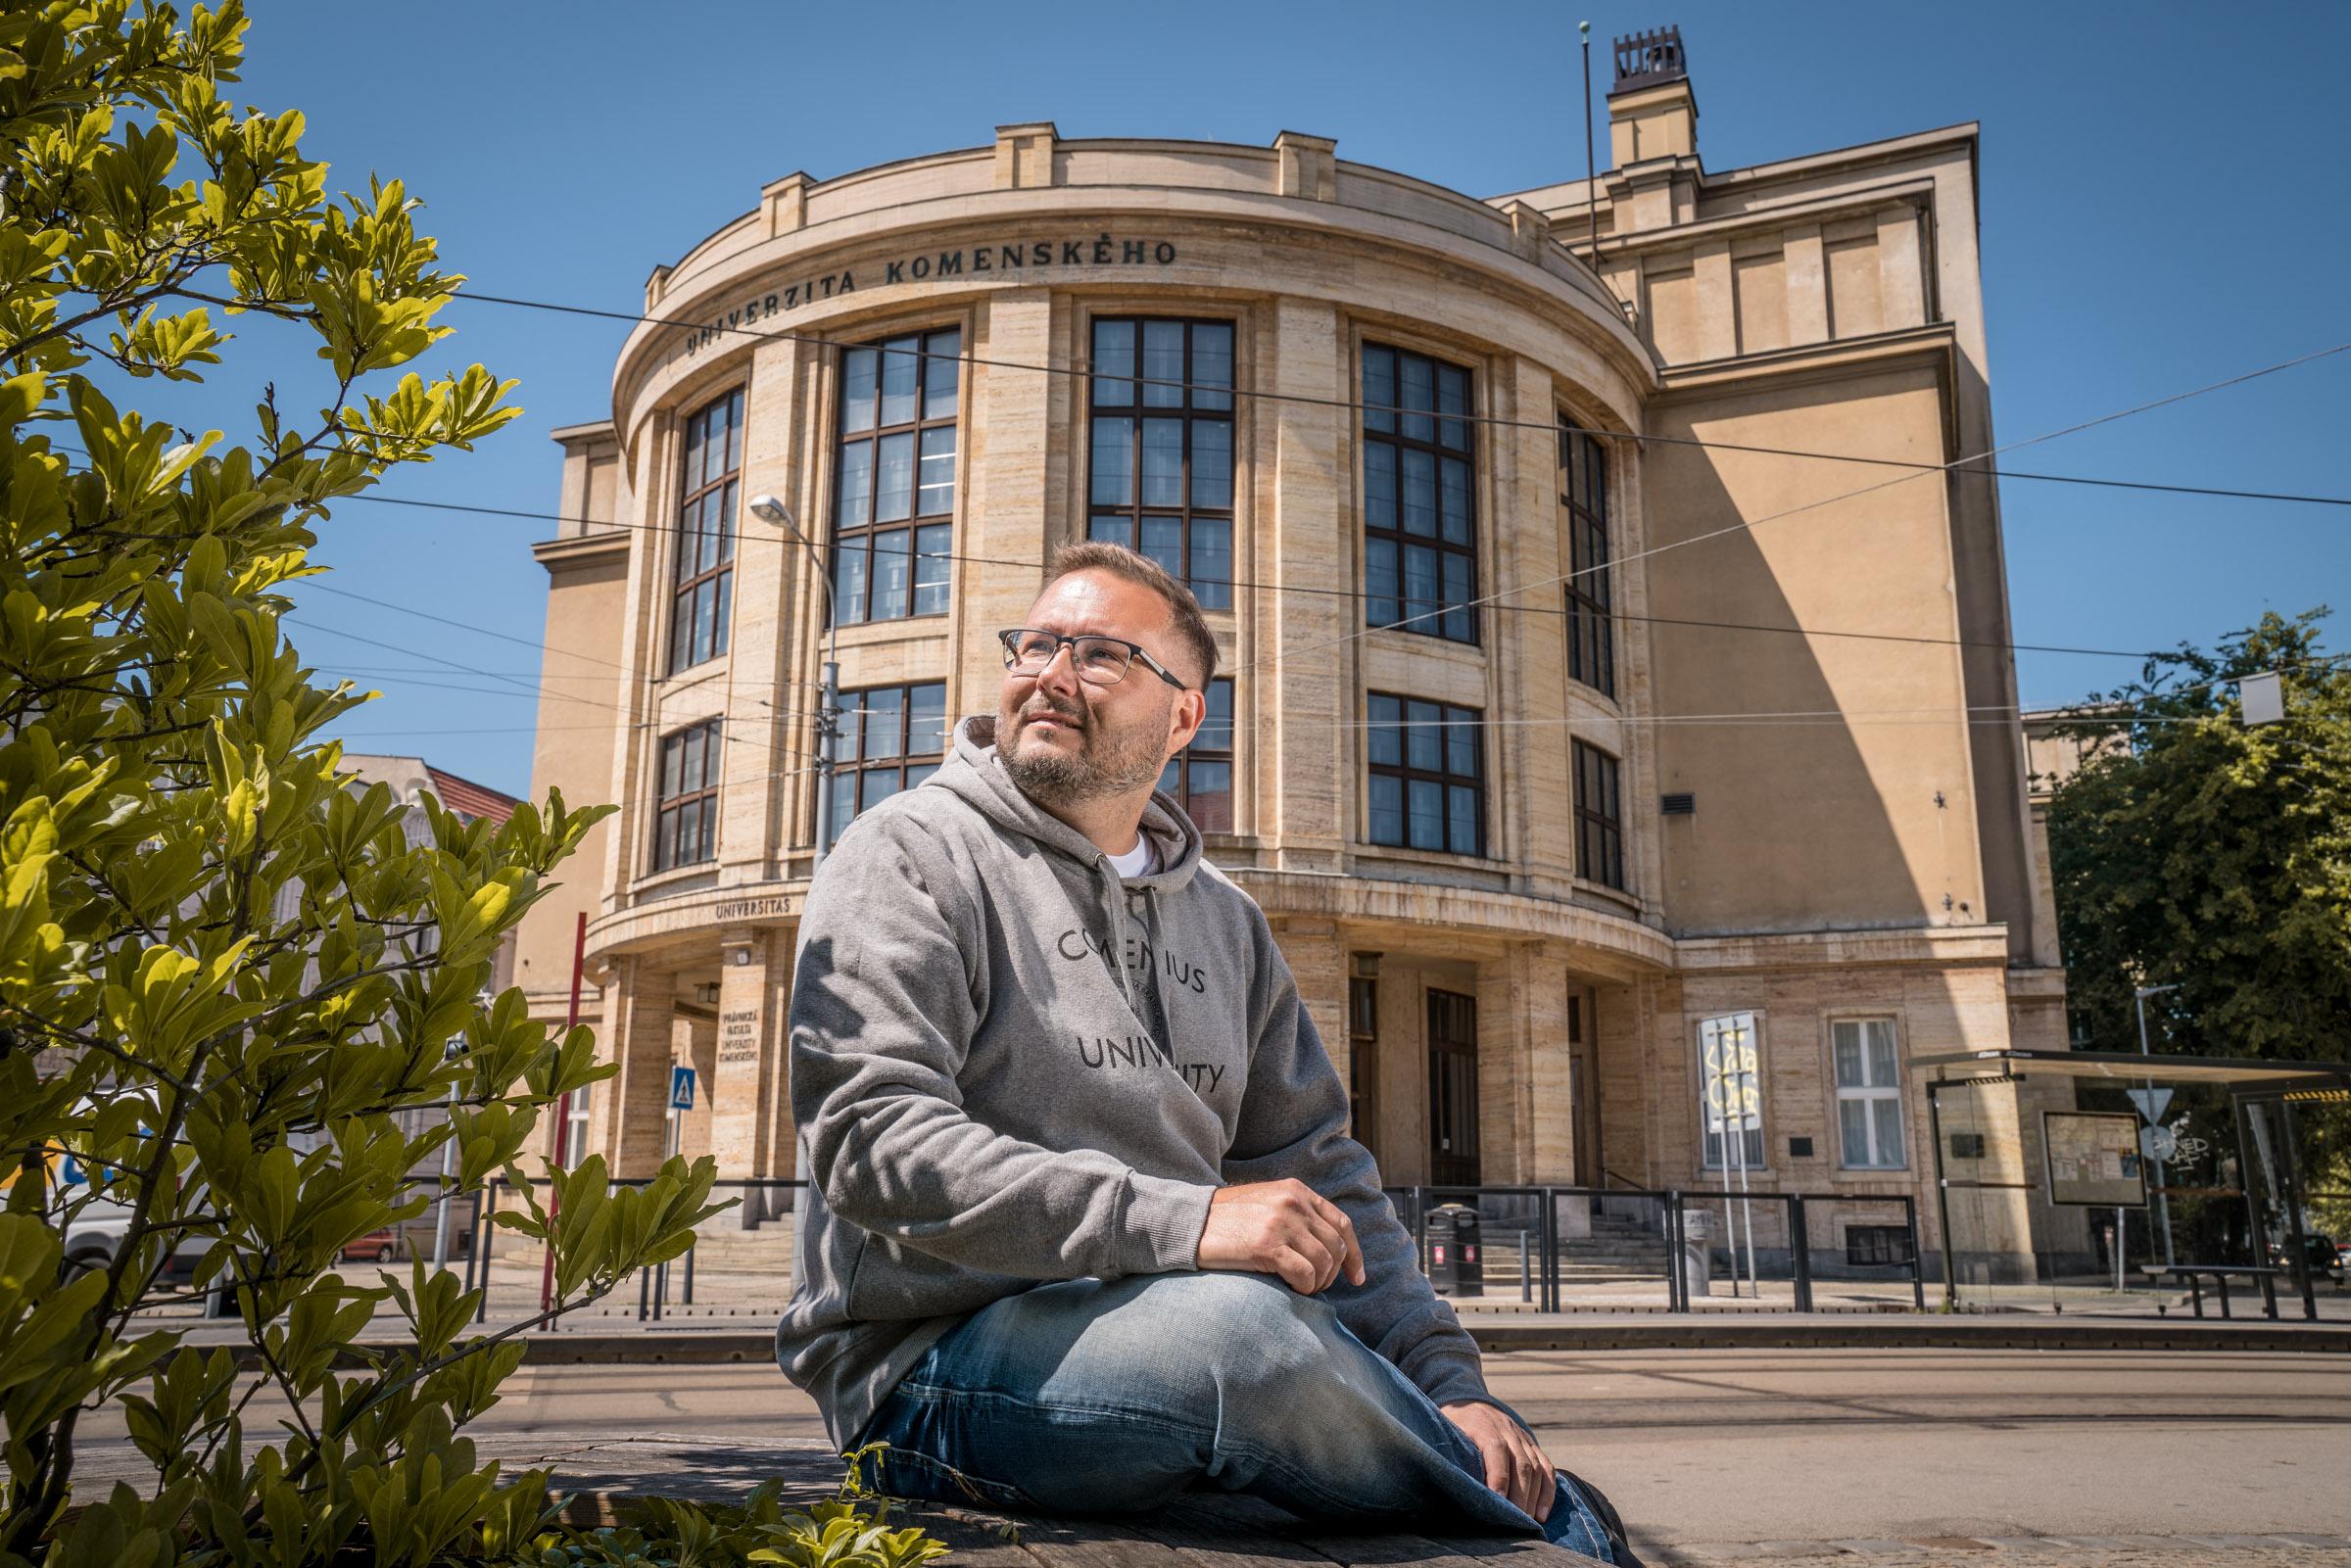 Masaryk Univerzita Komenského